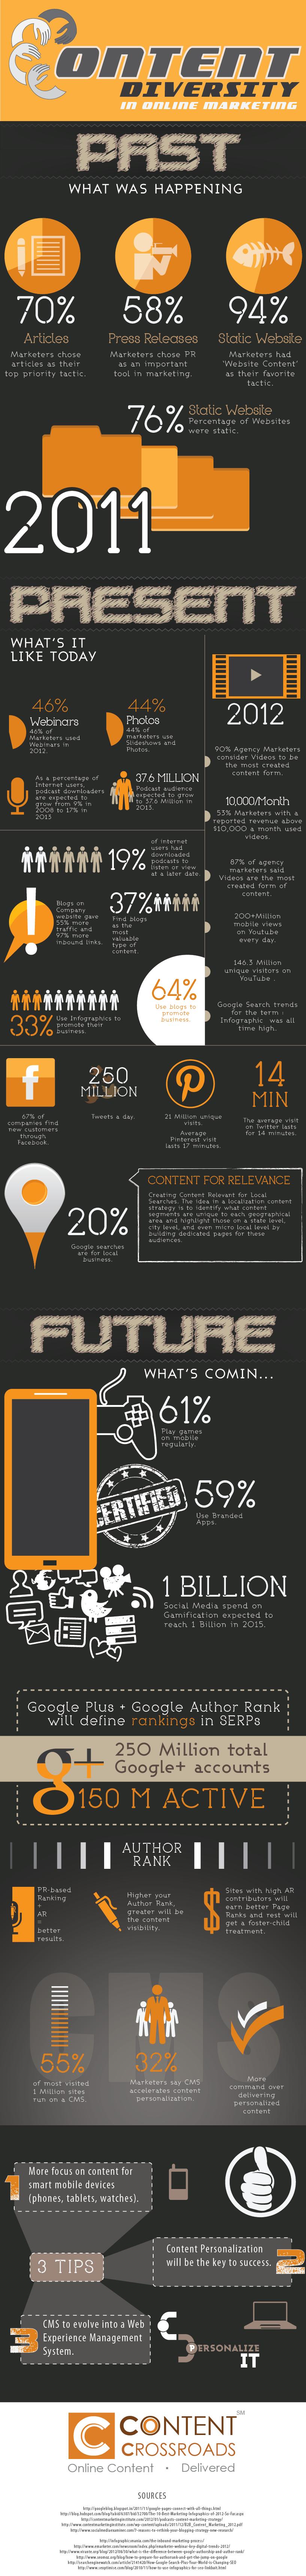 8. Content Diversity in Online Marketing